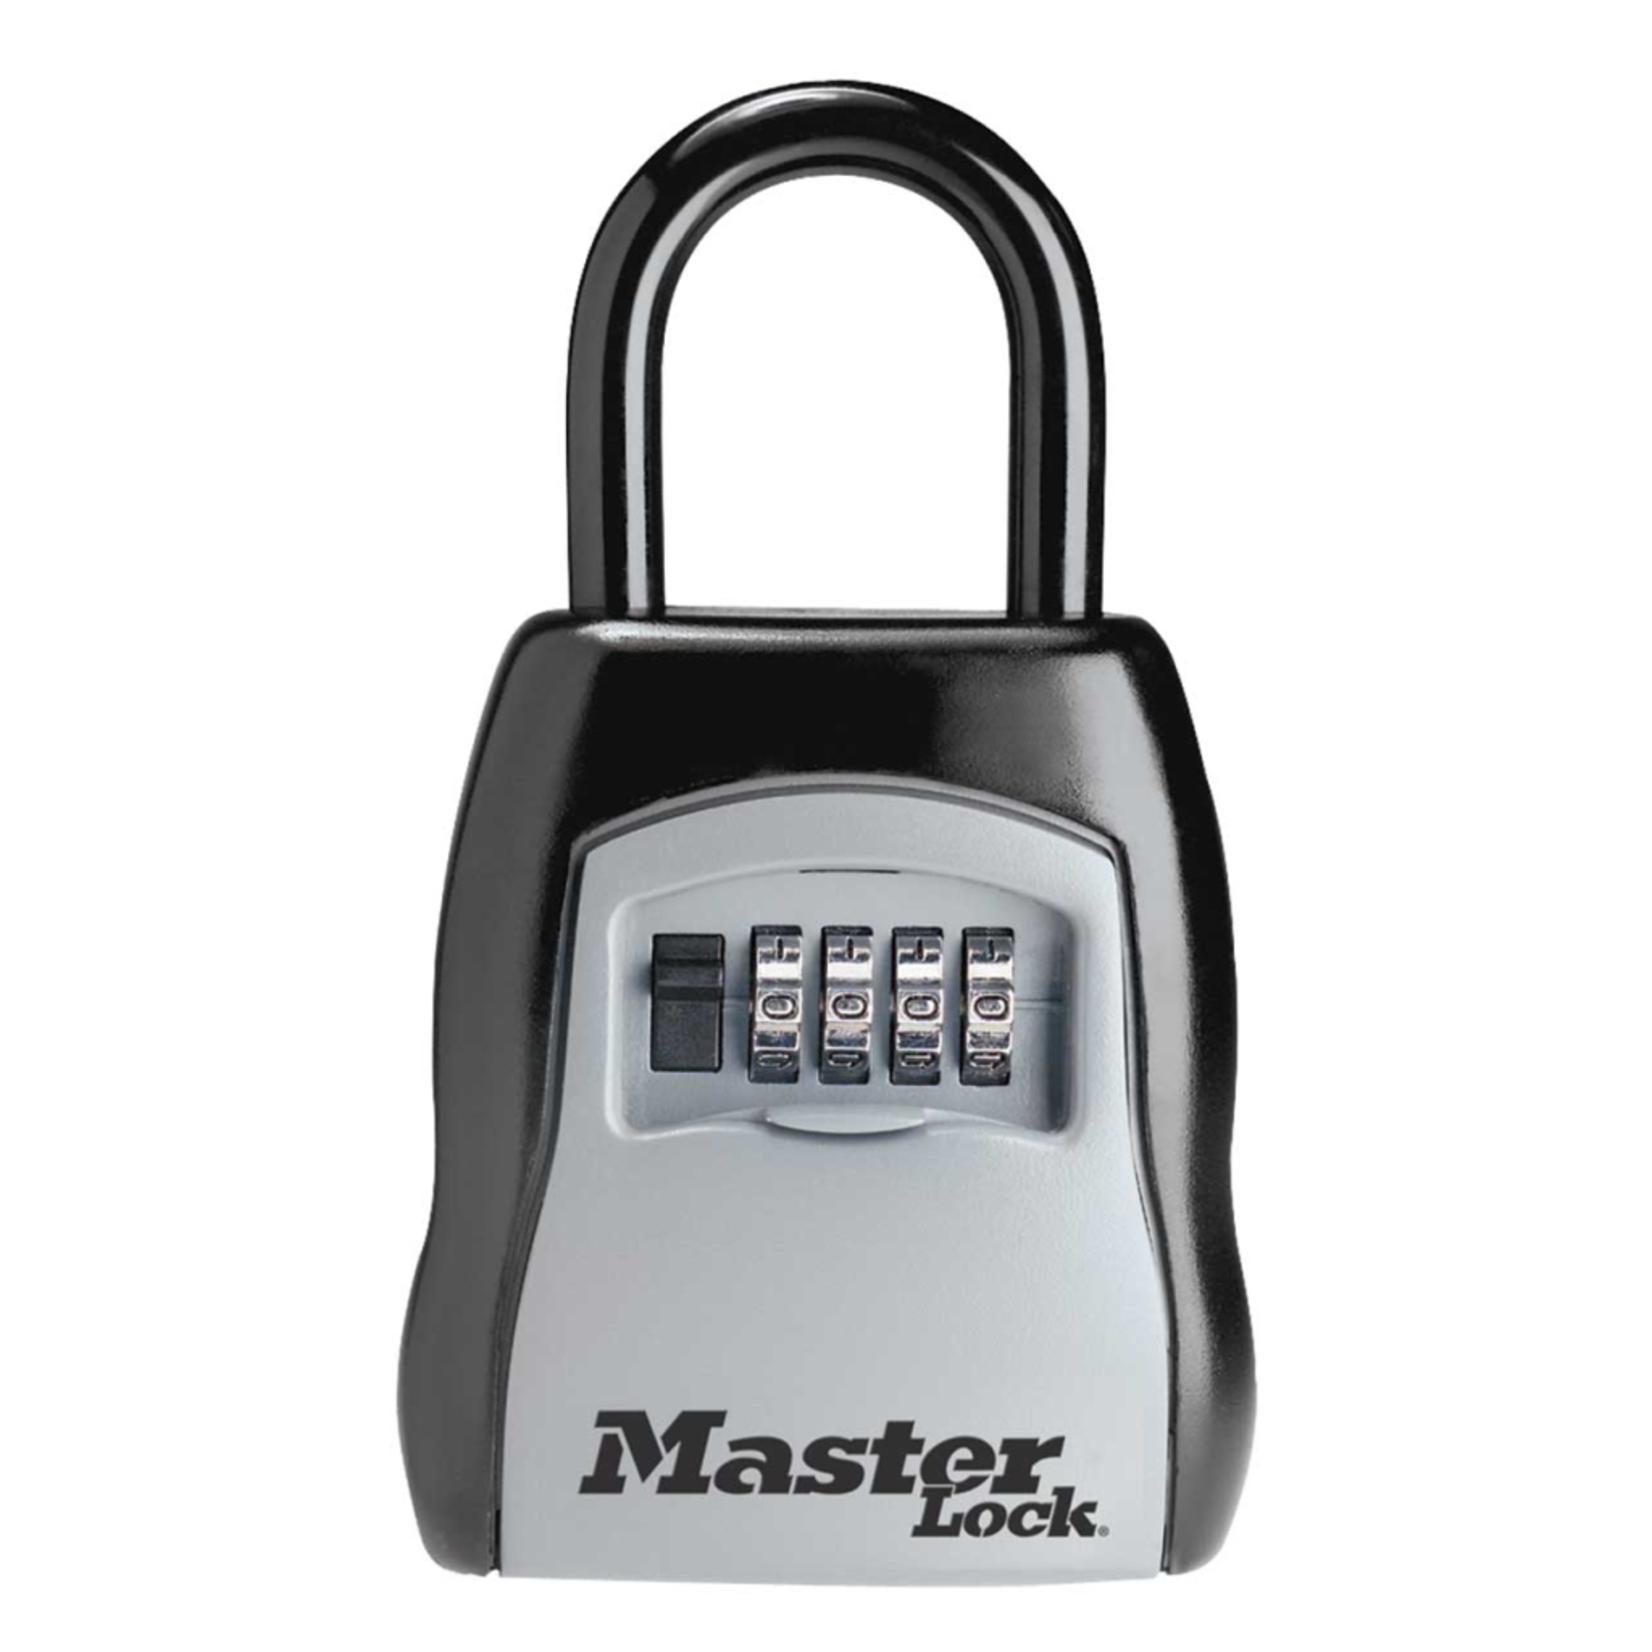 master lock Master Lock 5400D Safe Space Portable Lock Box